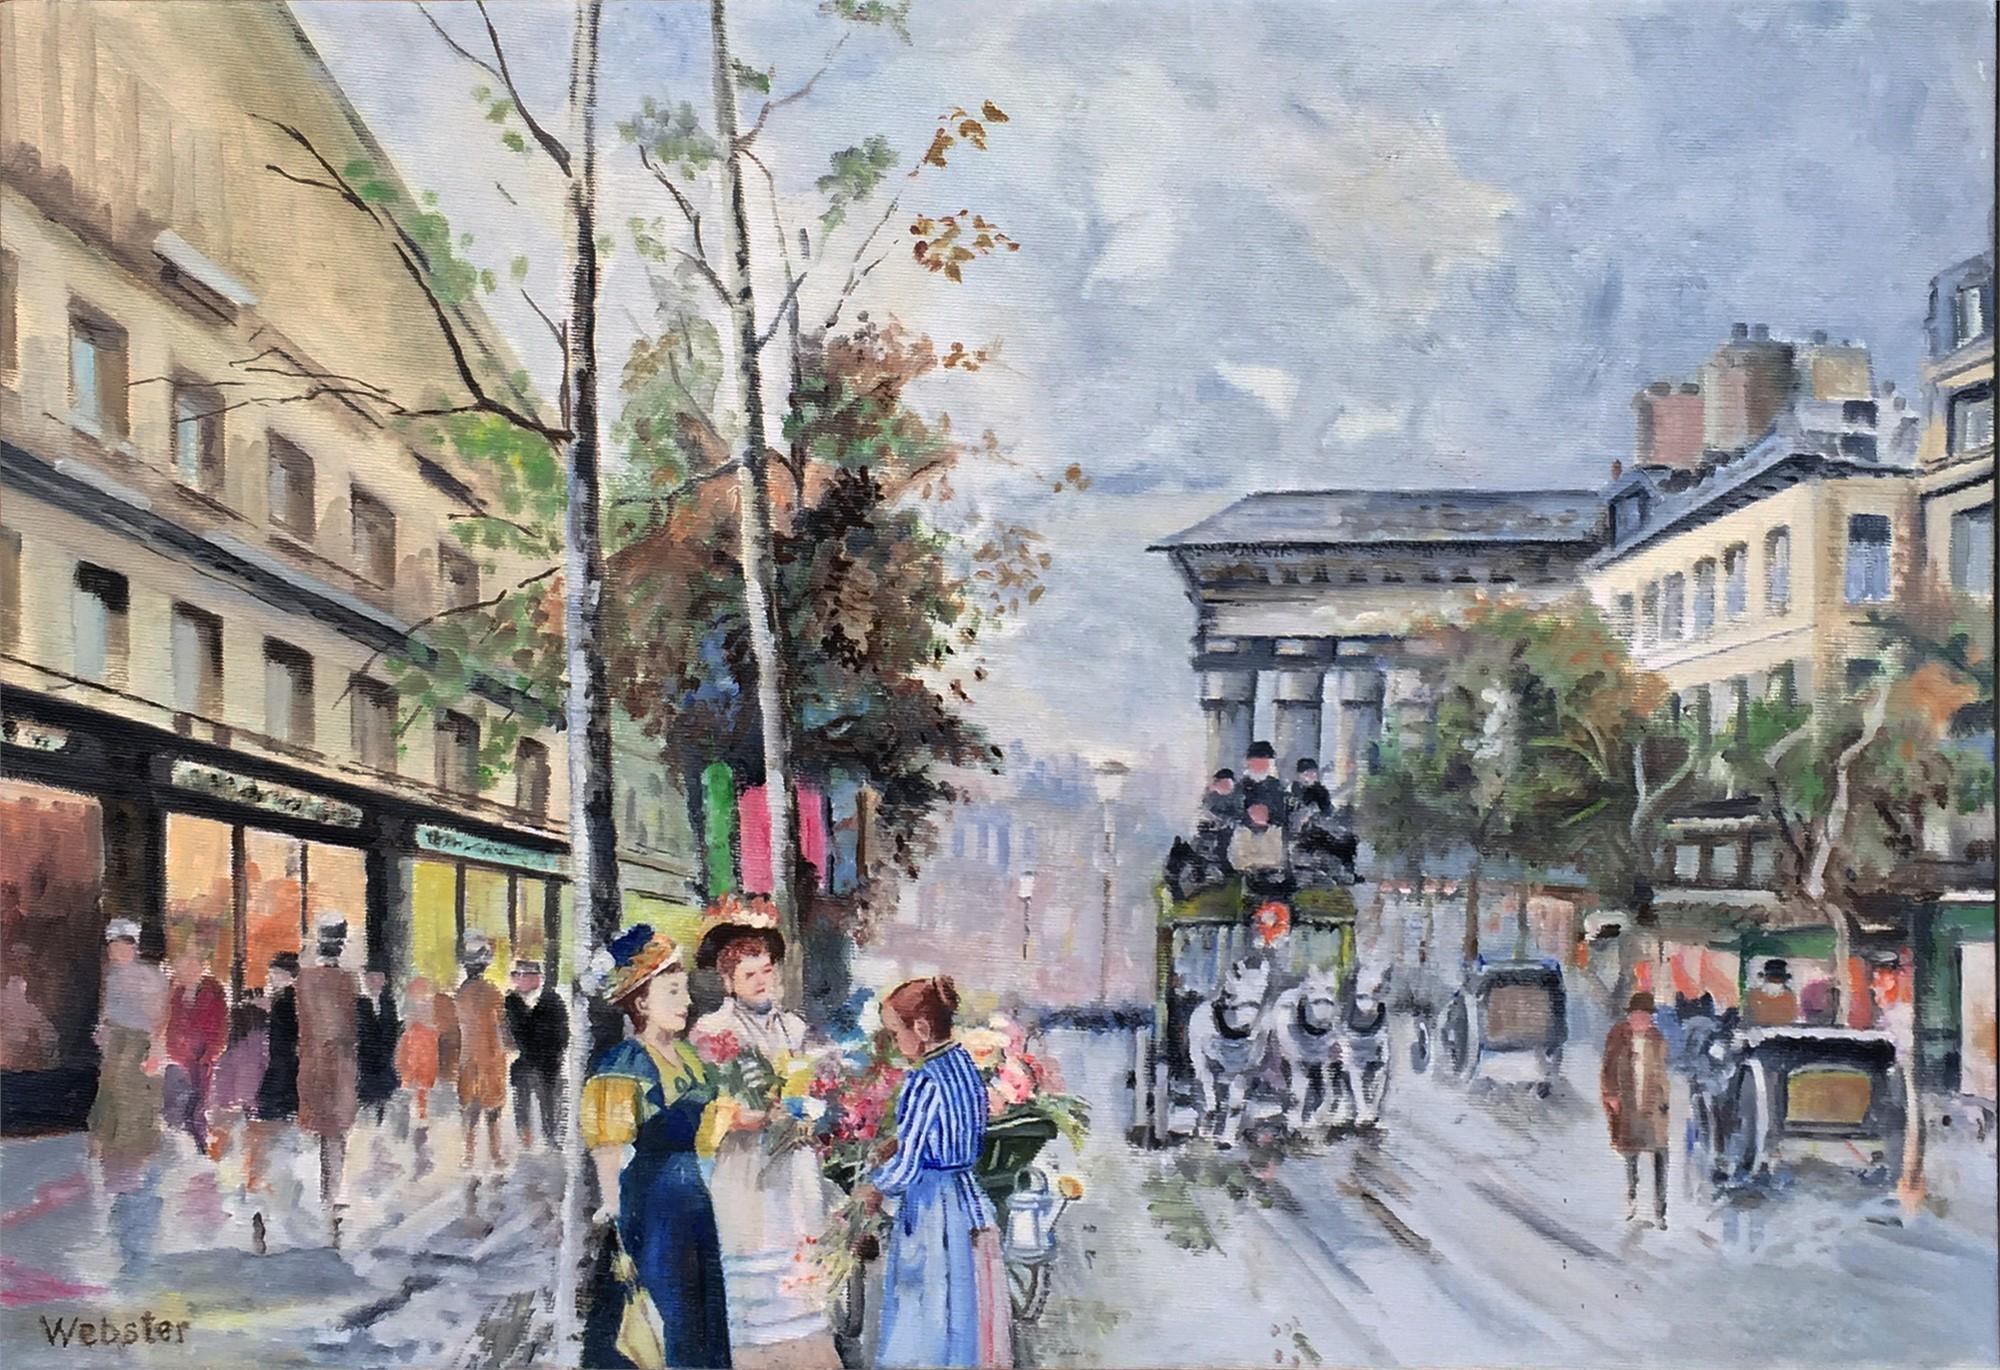 PARIS by WEBSTER